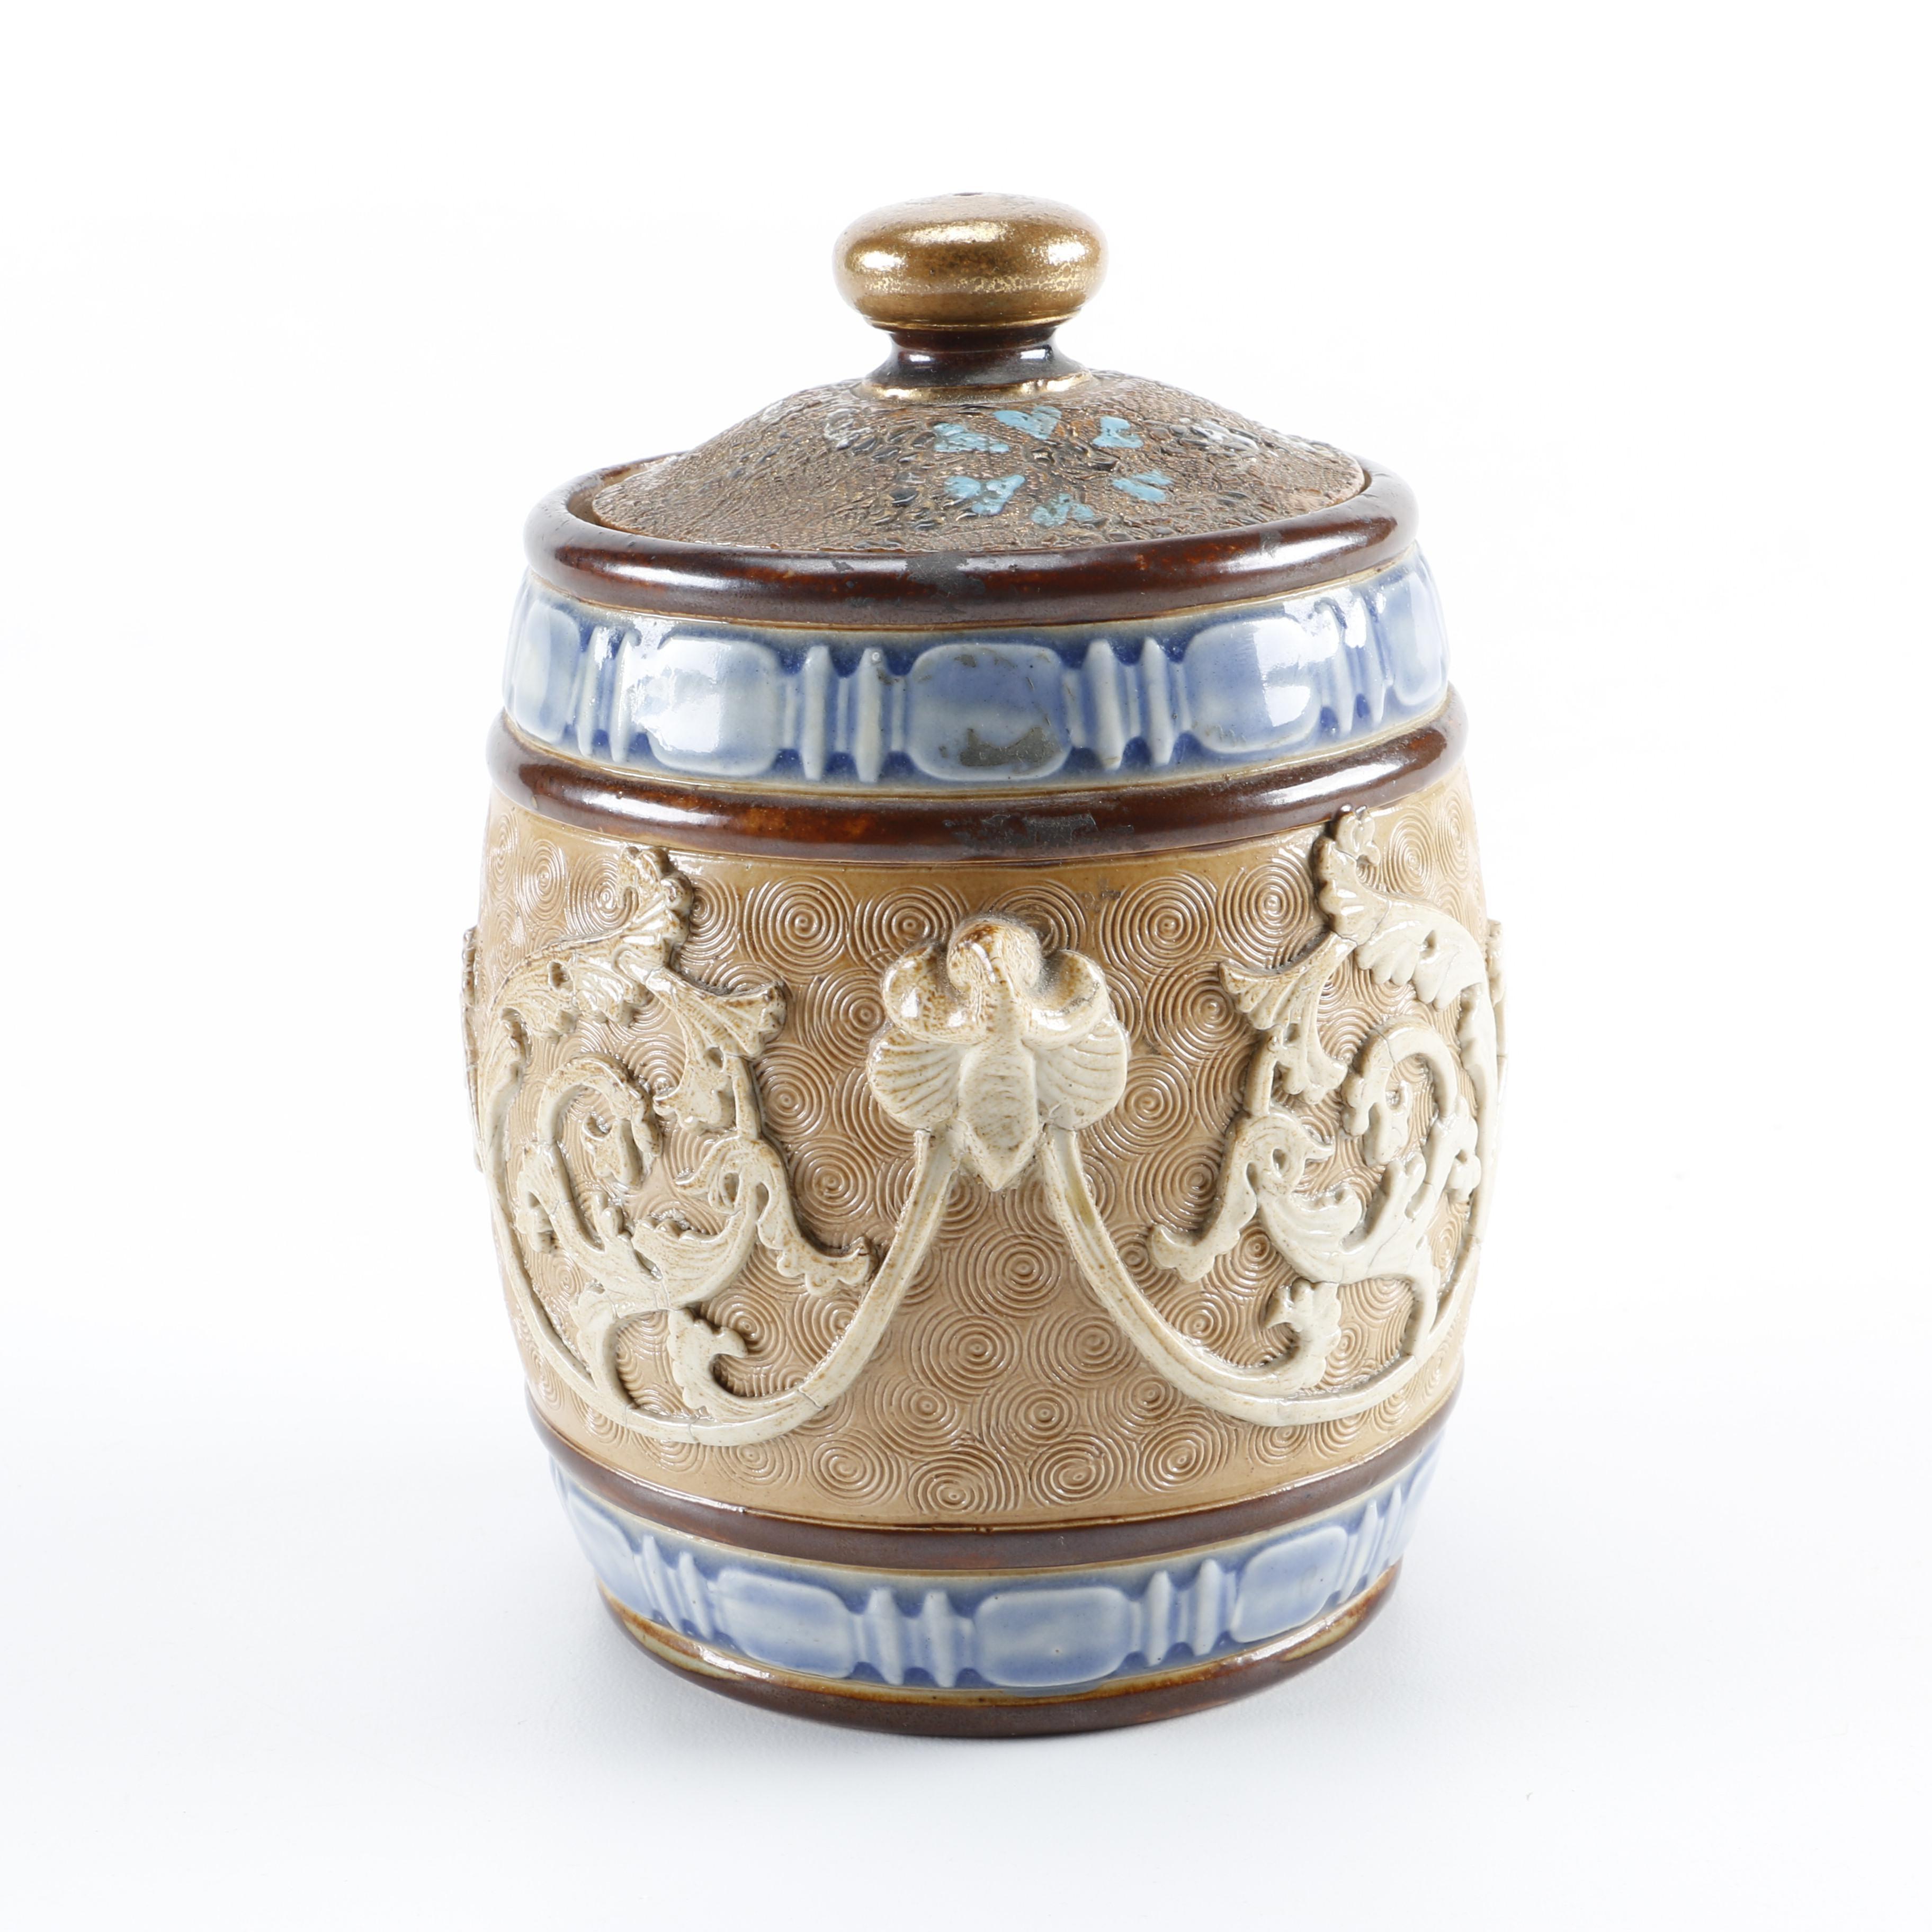 Early 20th-Century Royal Doulton Ceramic Tobacco Jar